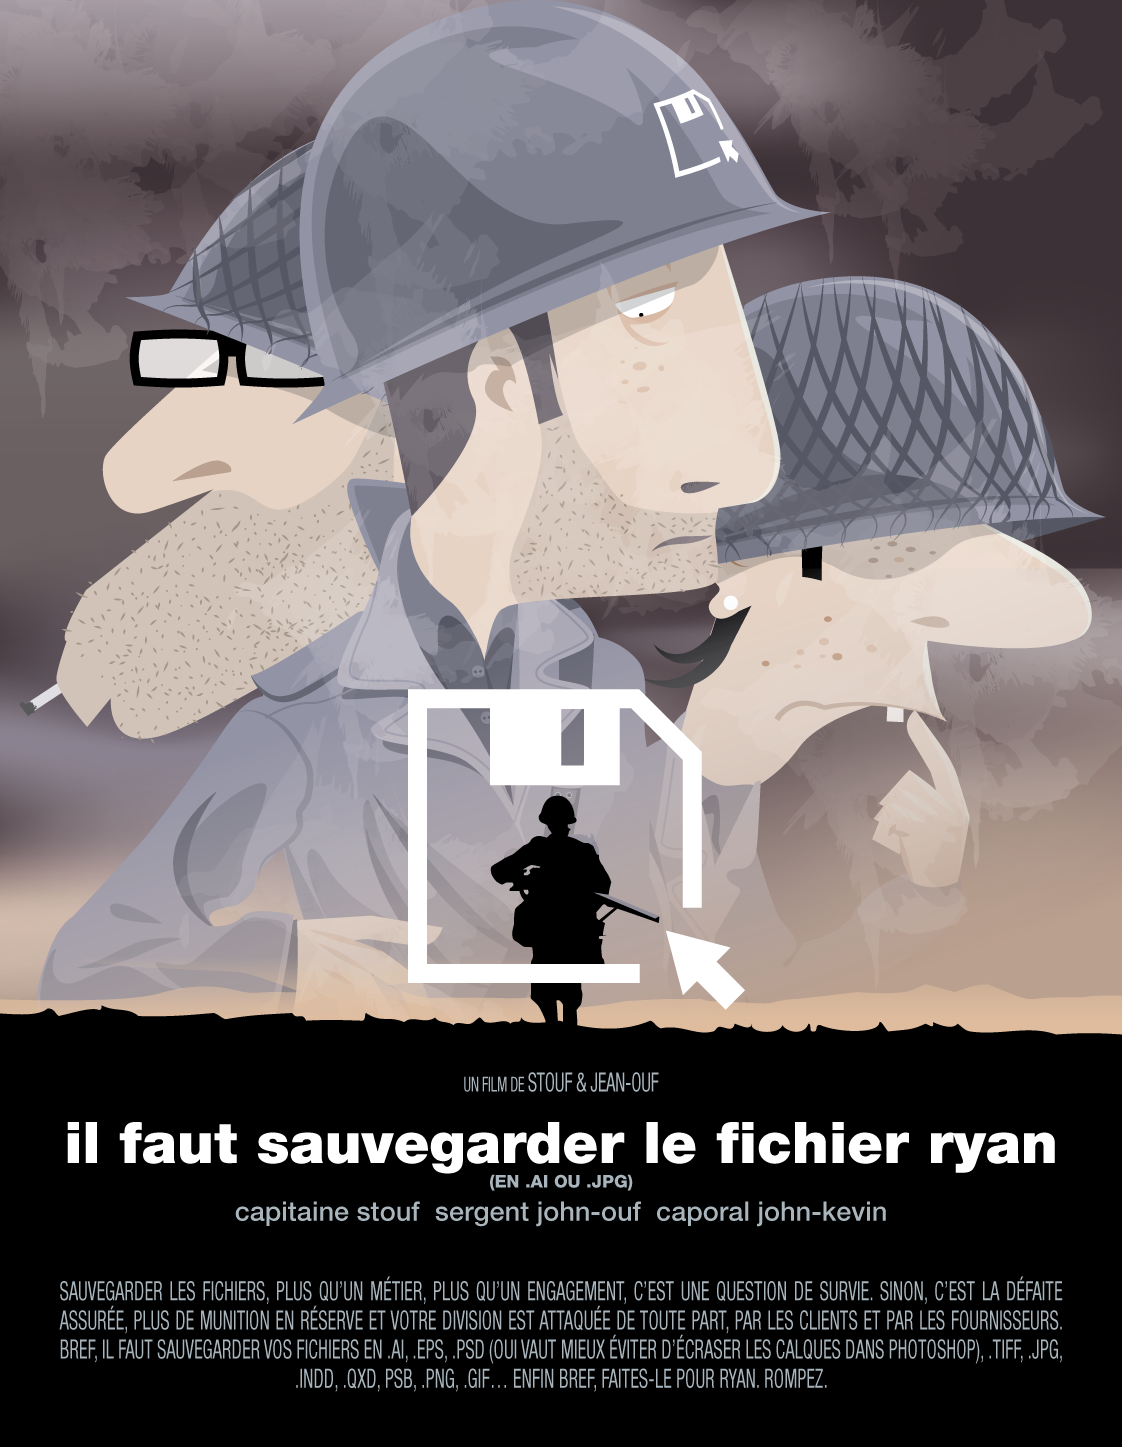 Fichier_Ryan